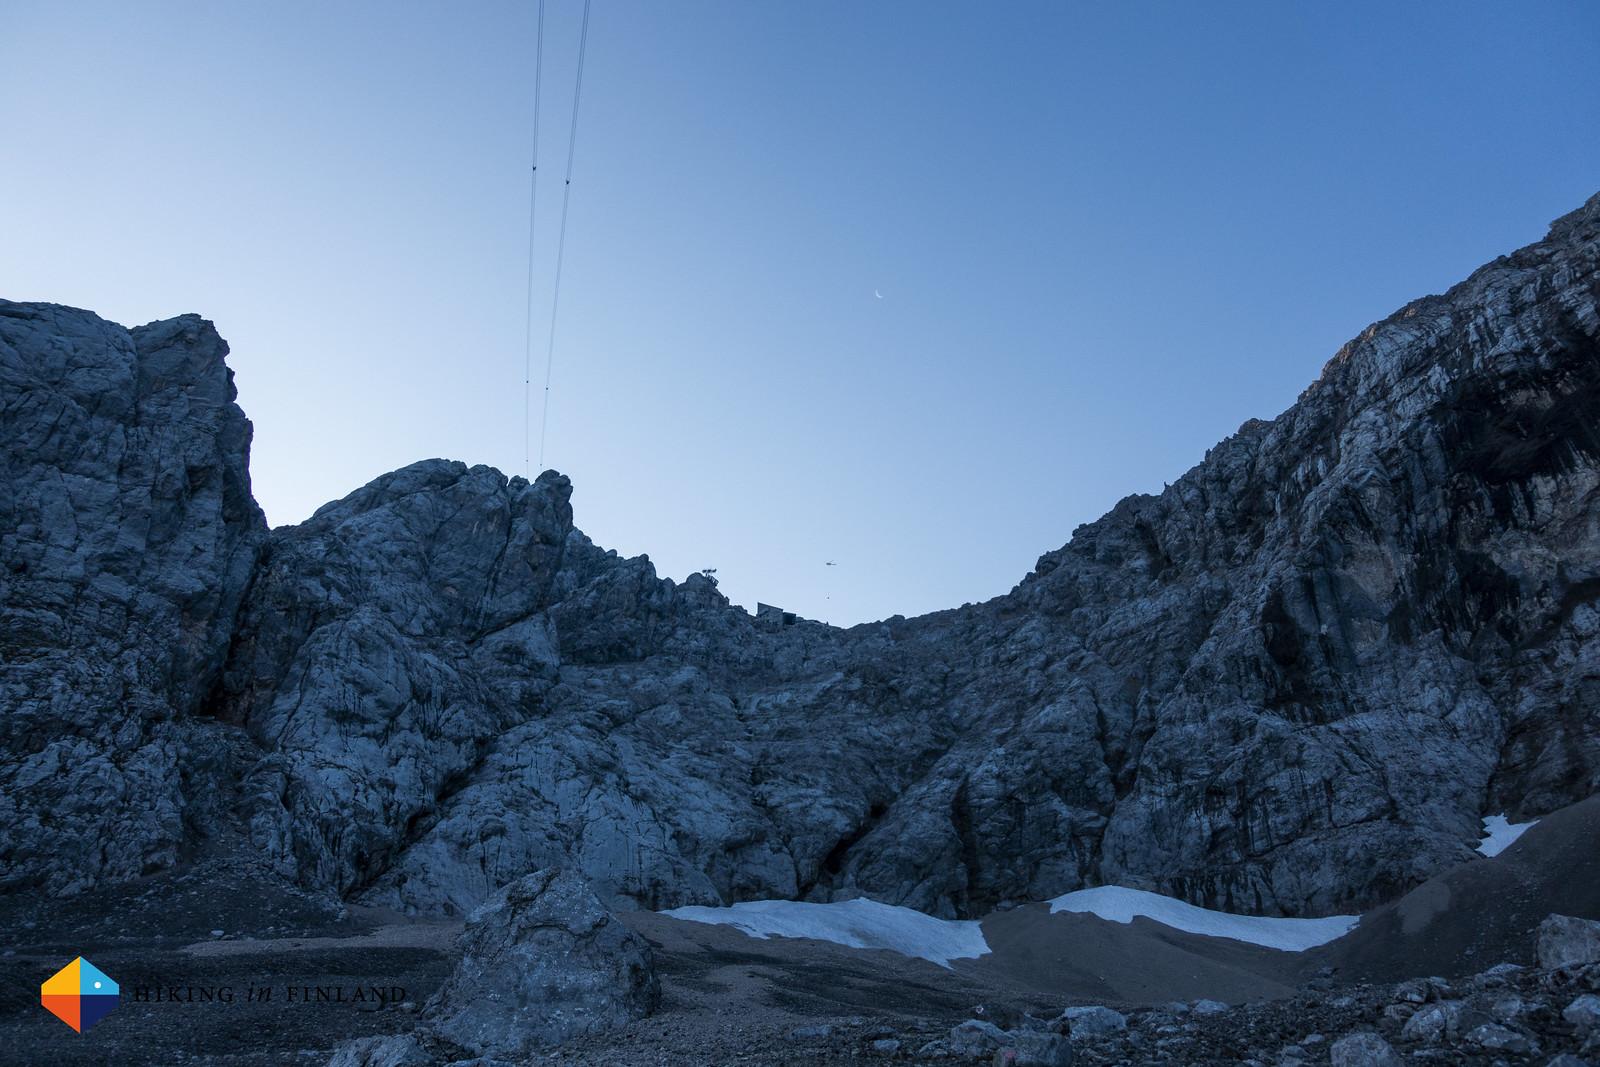 Schneekar + Stopselzieher Via Ferrata